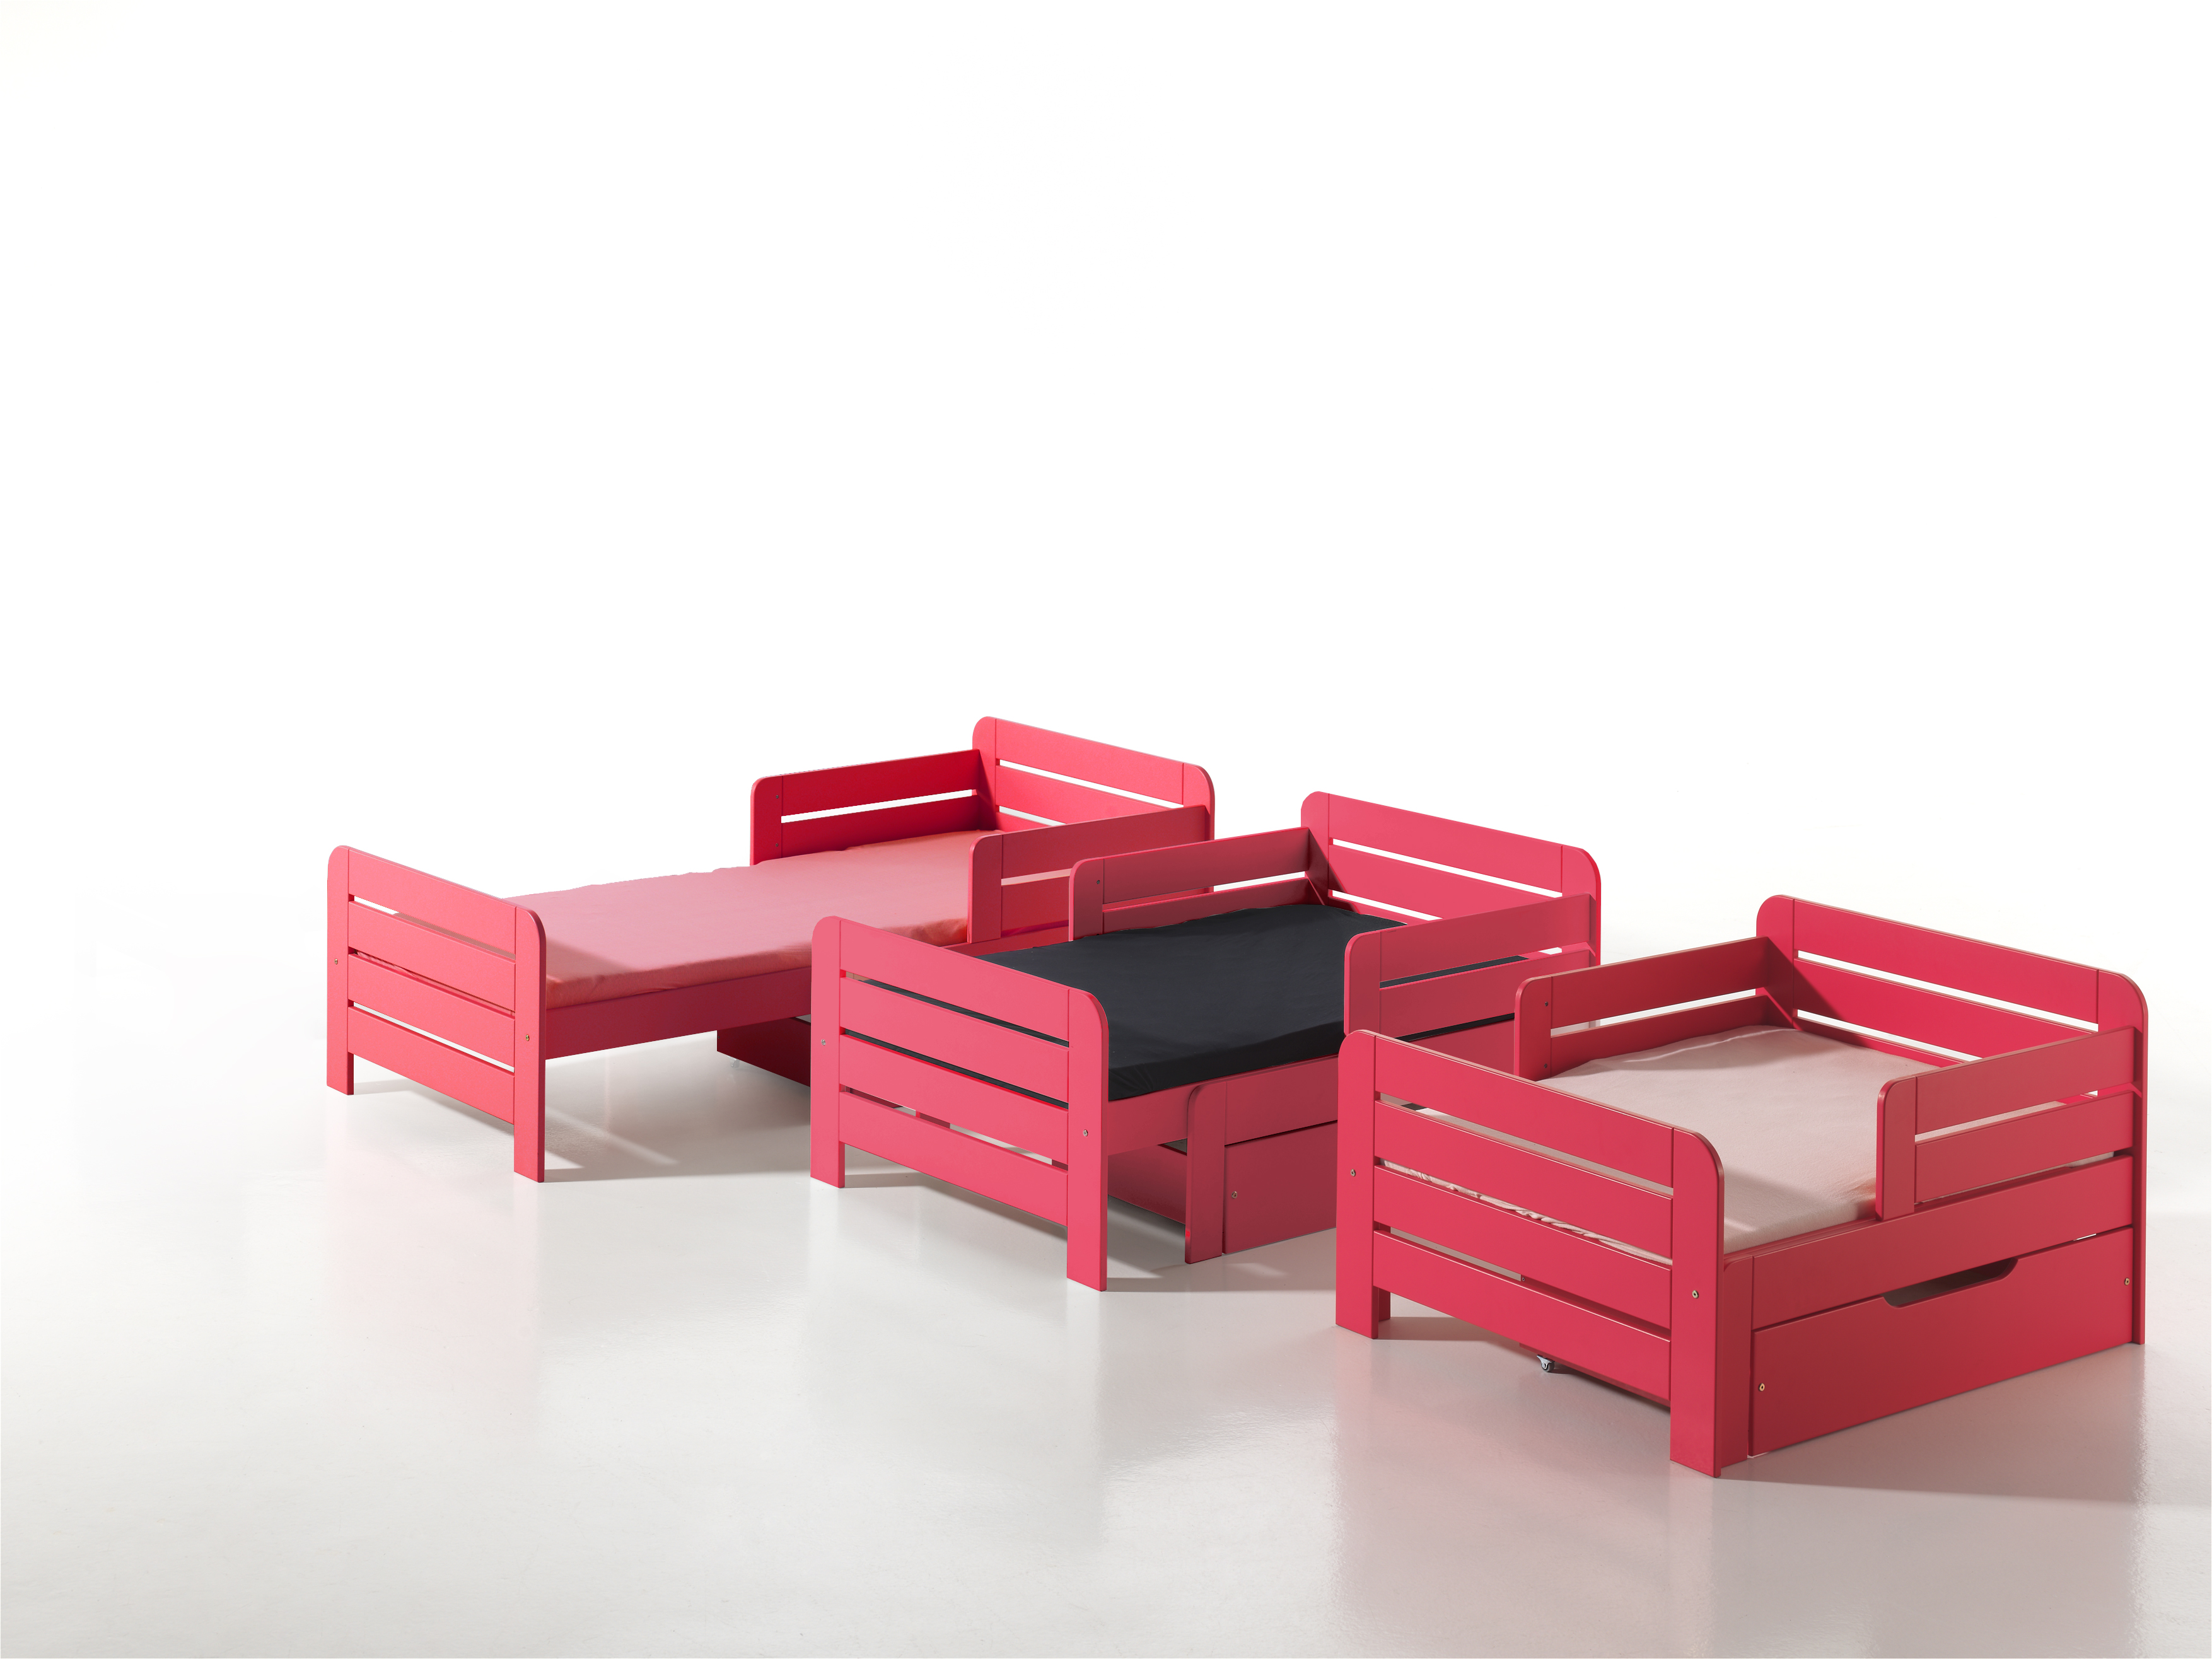 lit volutif pour enfant jumper fuchsia. Black Bedroom Furniture Sets. Home Design Ideas